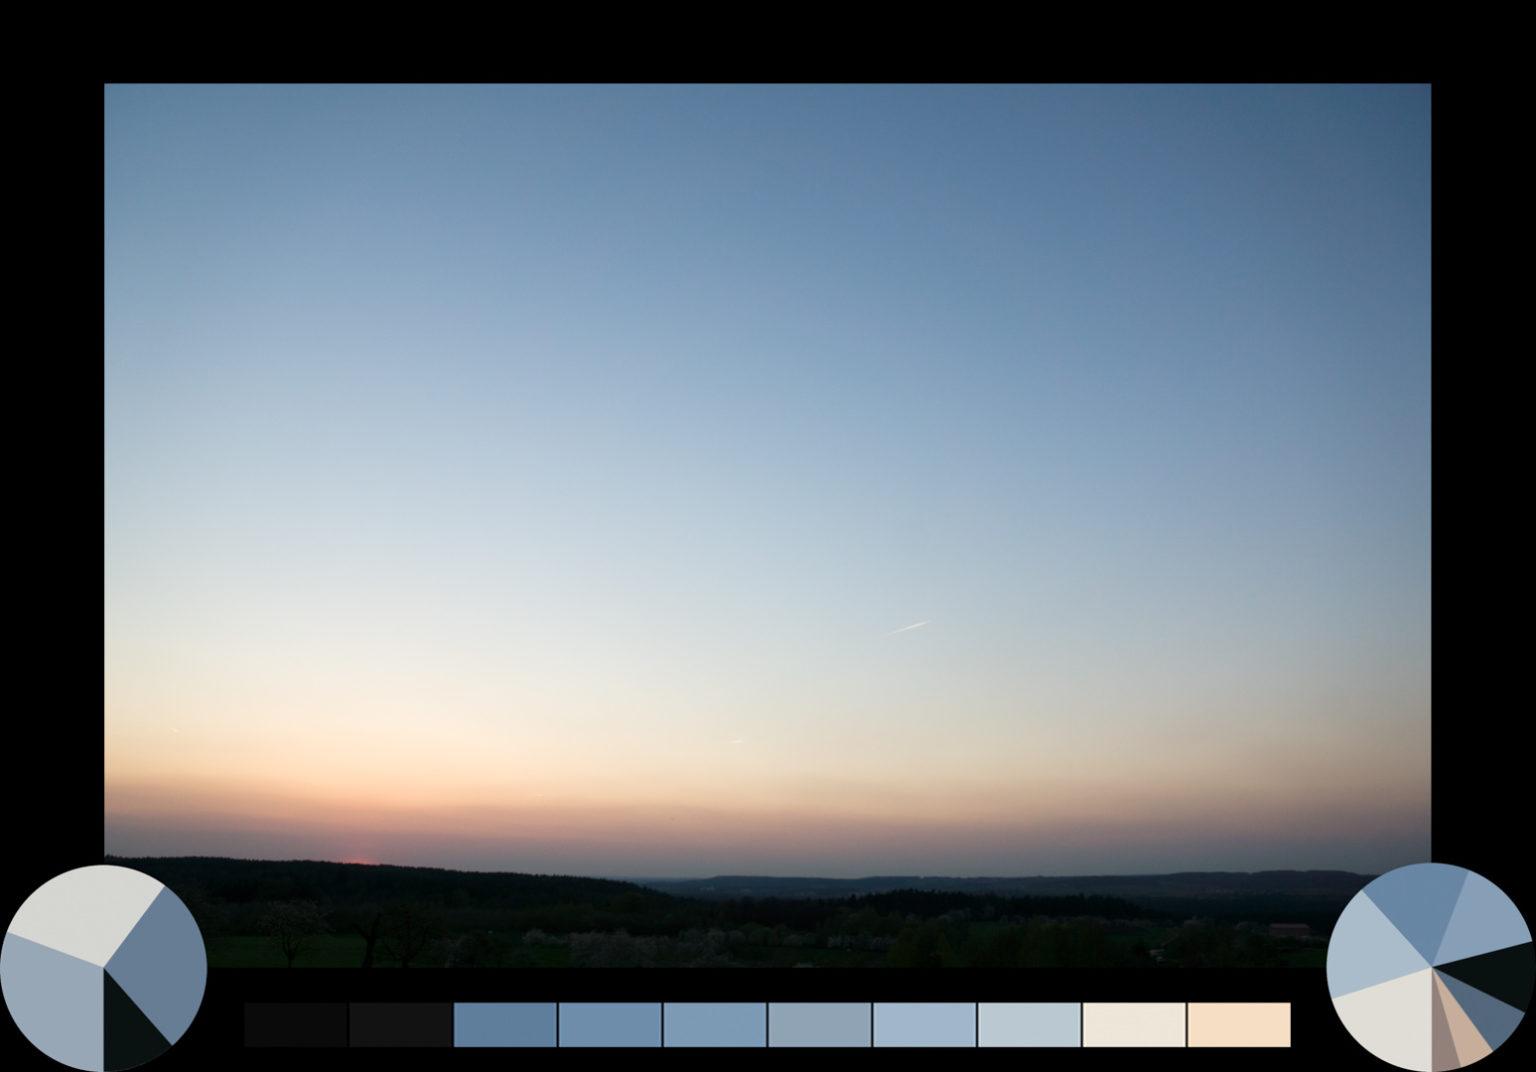 Sonnenuntergang bei Kalchreuth